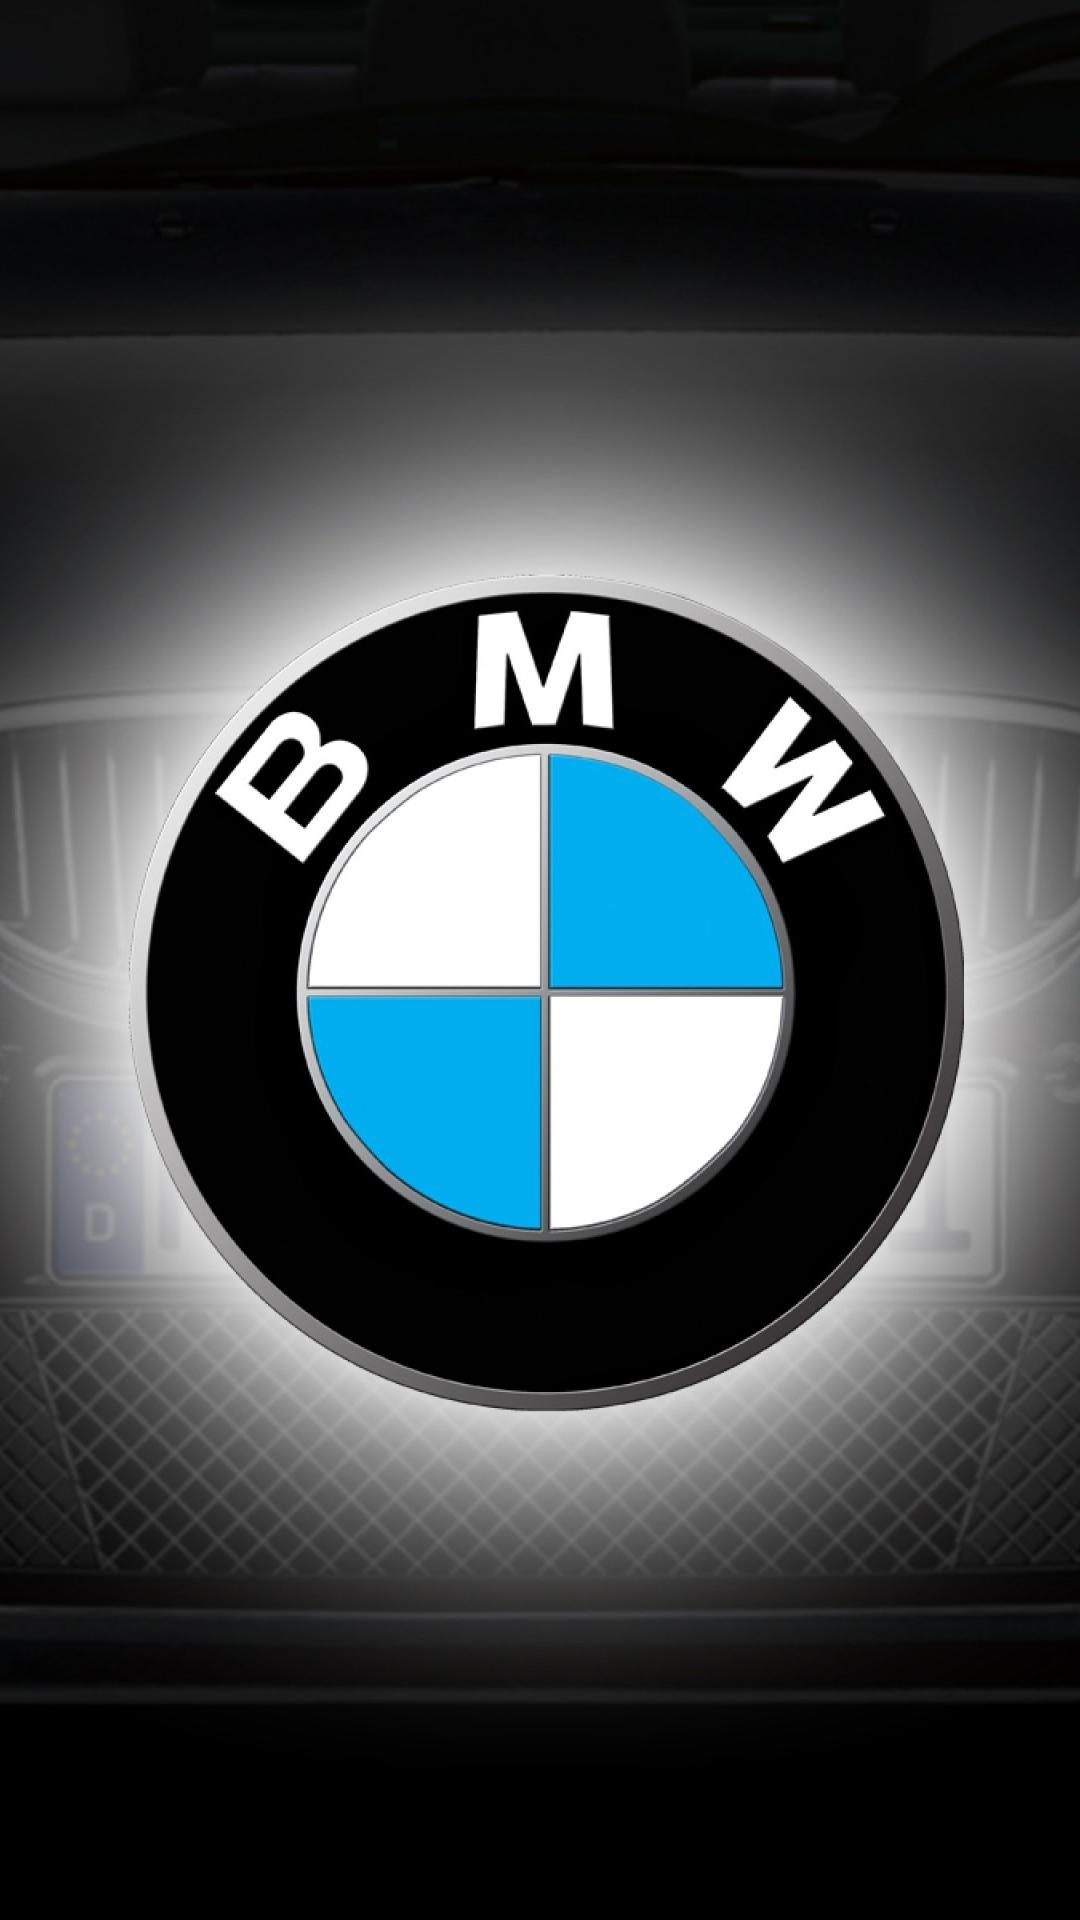 BMW Logo Grey Blue Car Android Wallpaper download 1080x1920